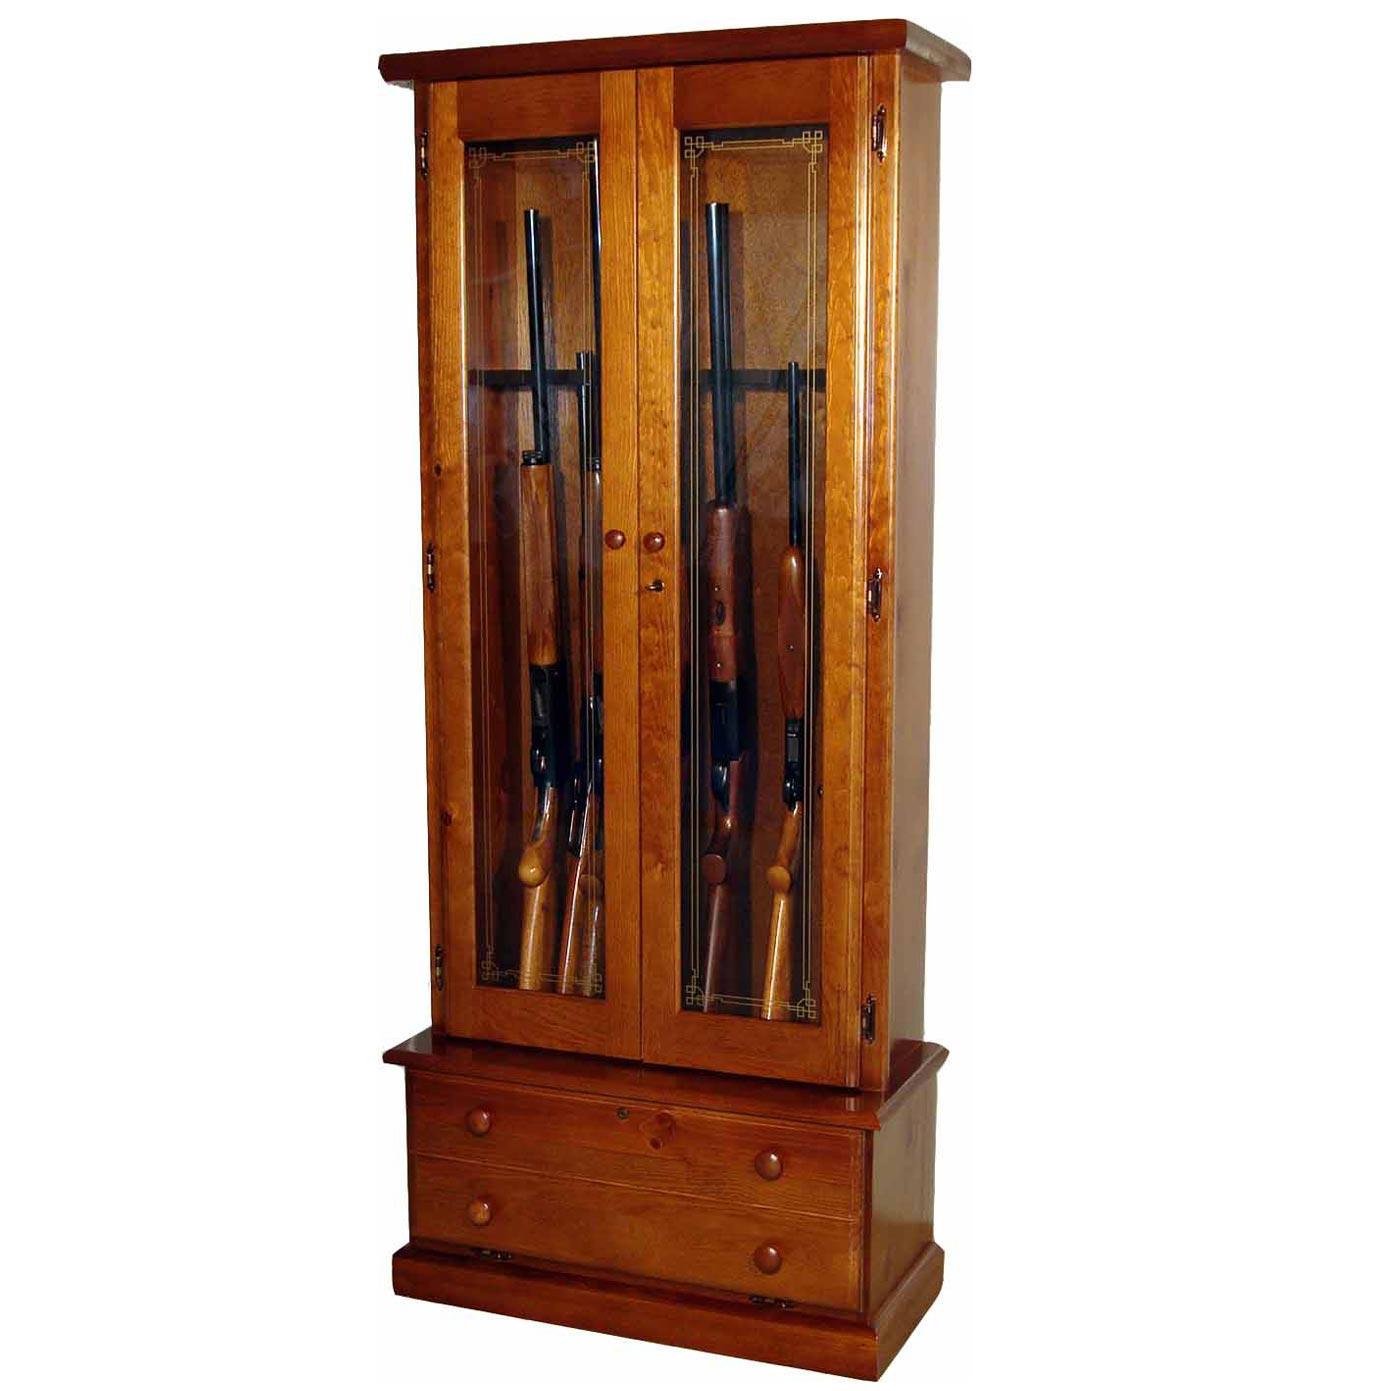 scout 1119 gun cabinet solid pine 12 gun gs1119. Black Bedroom Furniture Sets. Home Design Ideas